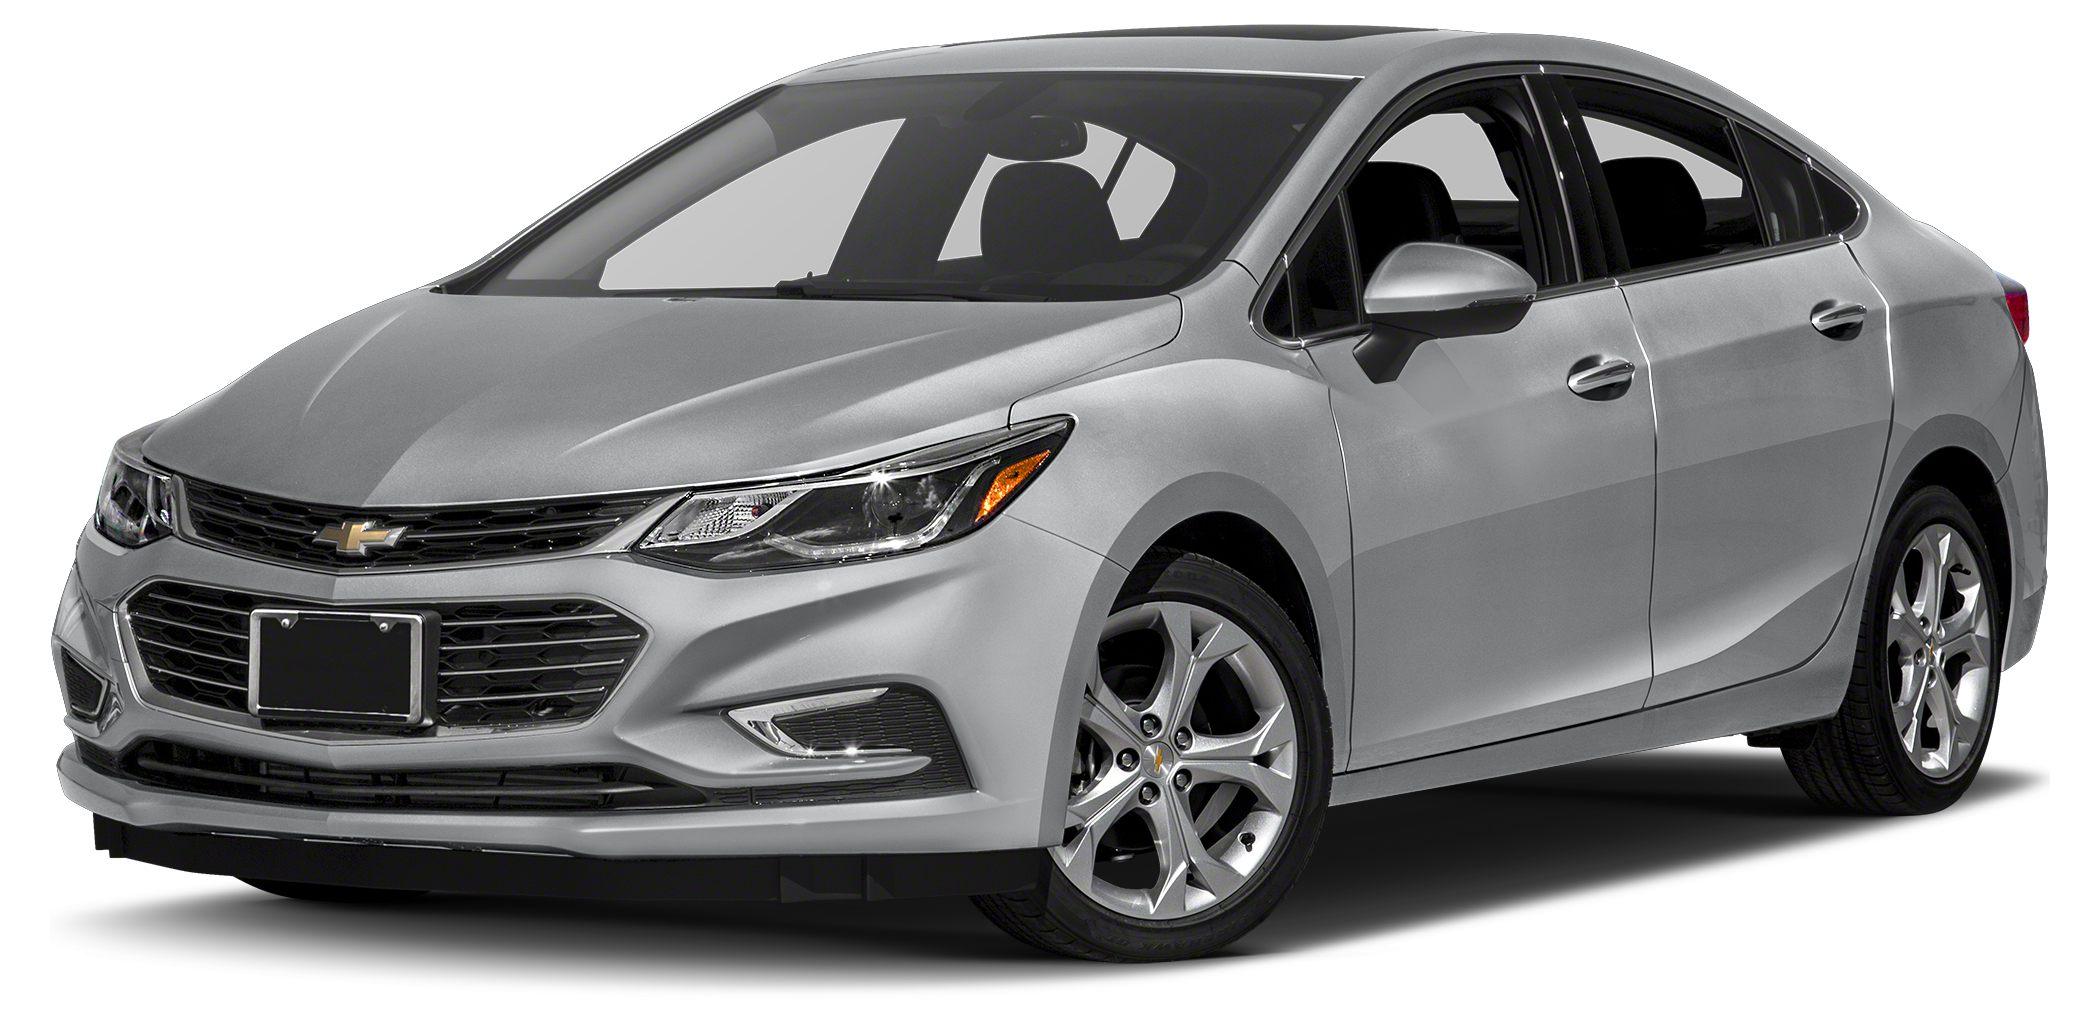 2016 Chevrolet Cruze LT Moonroof Heated Seats Aluminum Wheels SUNROOF PACKAGE Turbo Charged En